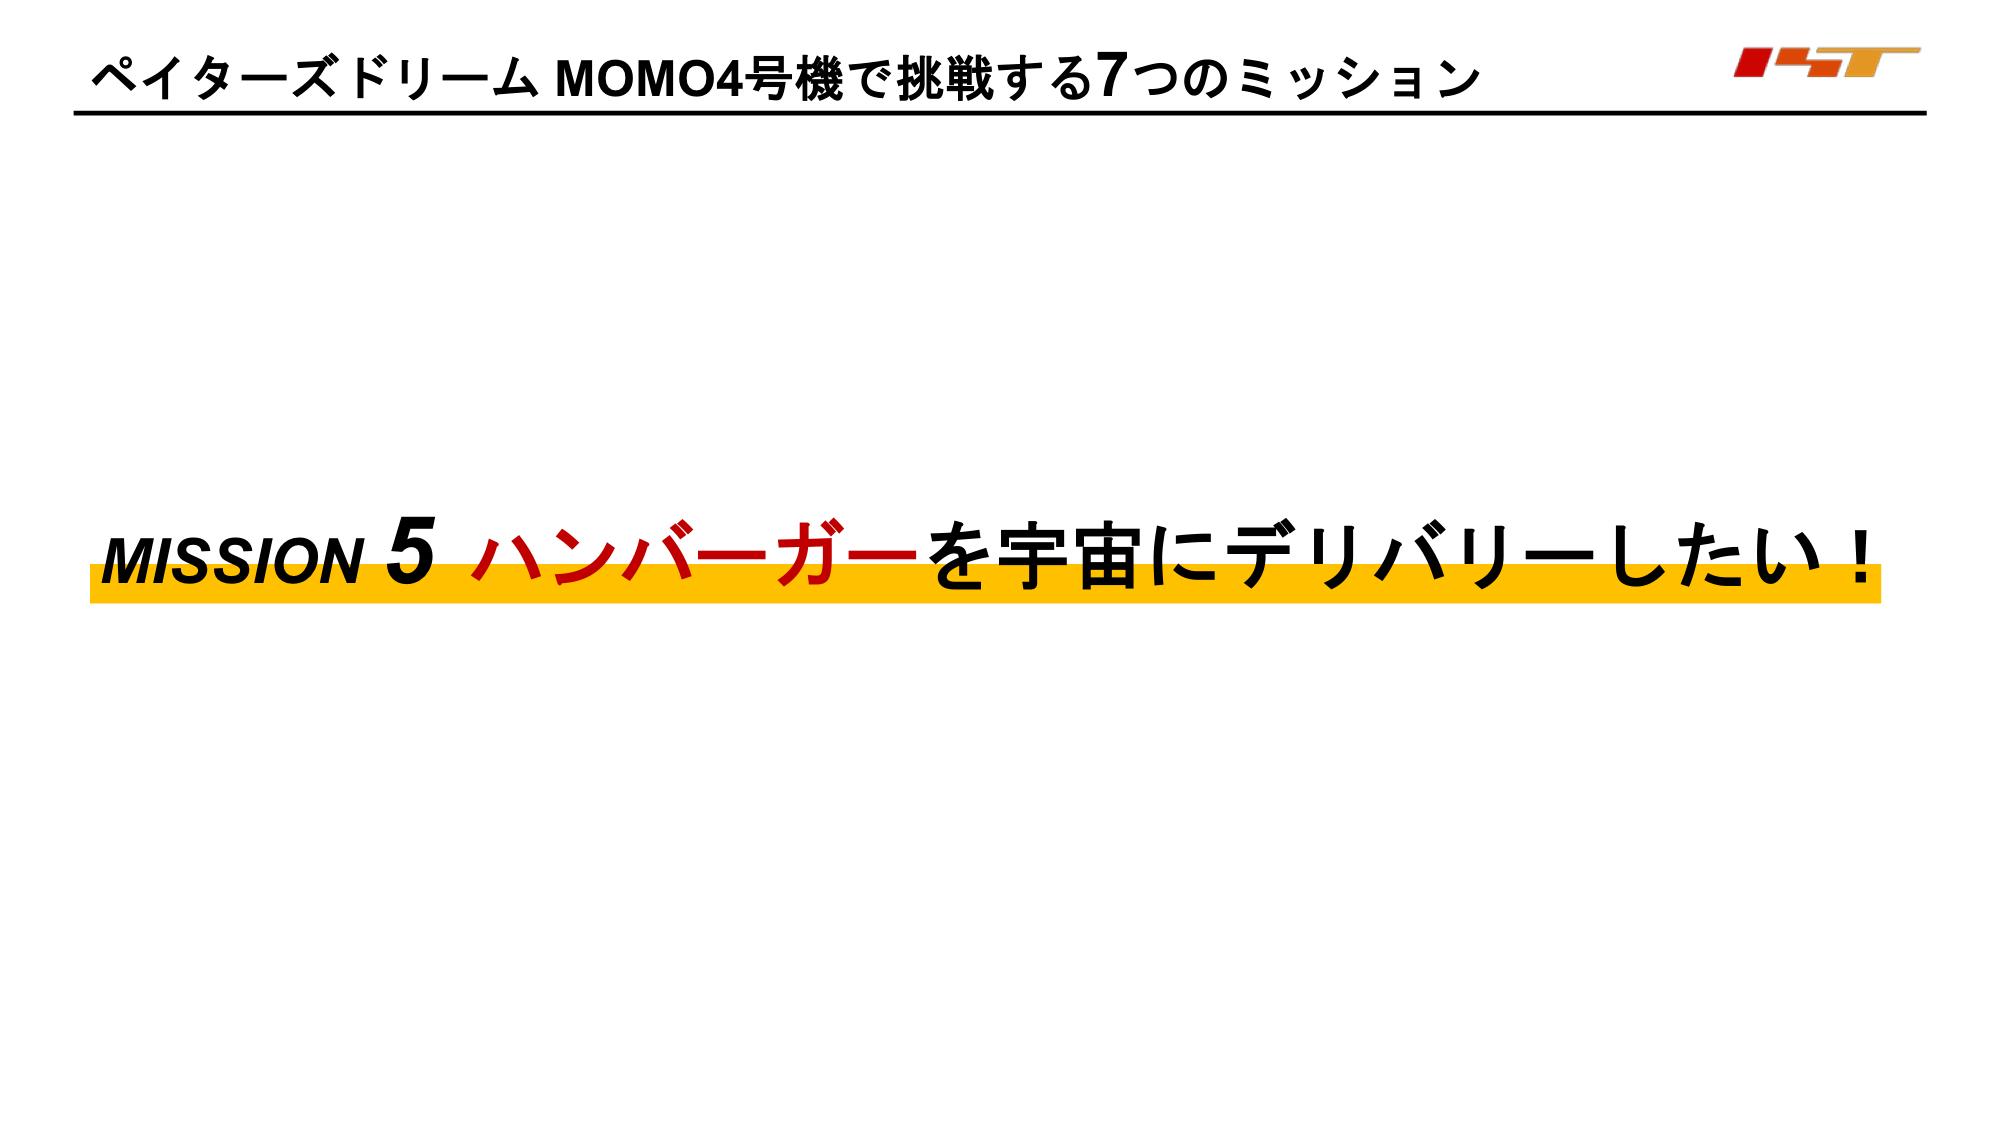 f:id:Imamura:20190628161314p:plain